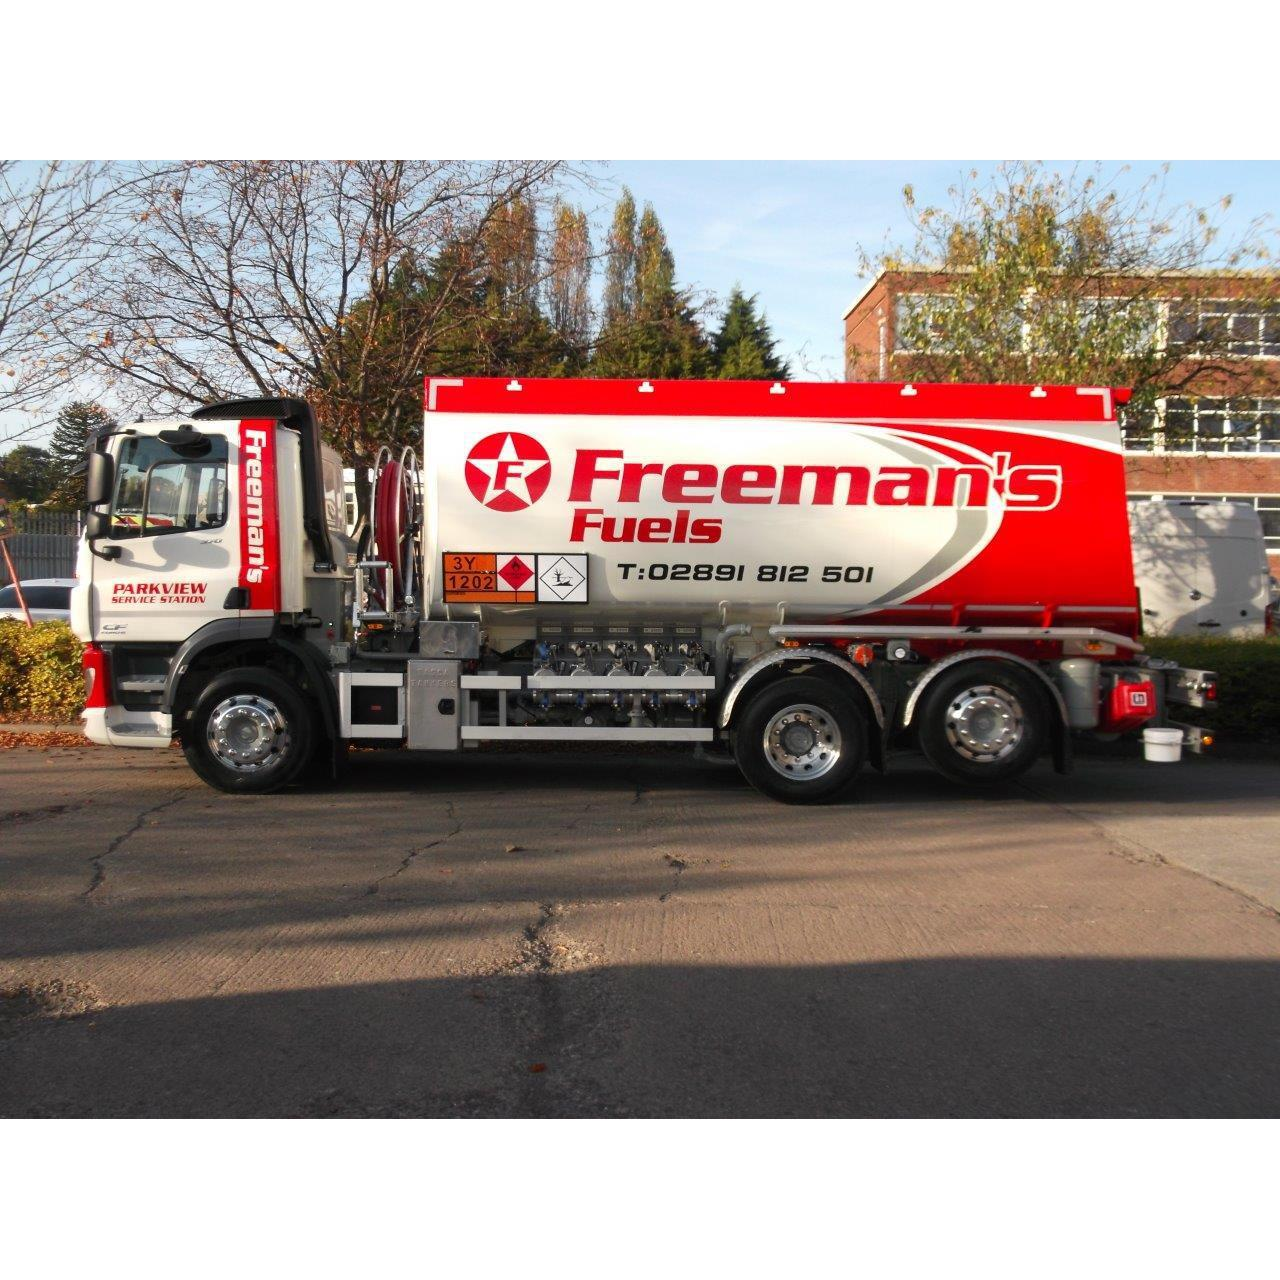 Freeman's Fuels - Newtownards, County Down BT23 8SG - 02891 812501 | ShowMeLocal.com